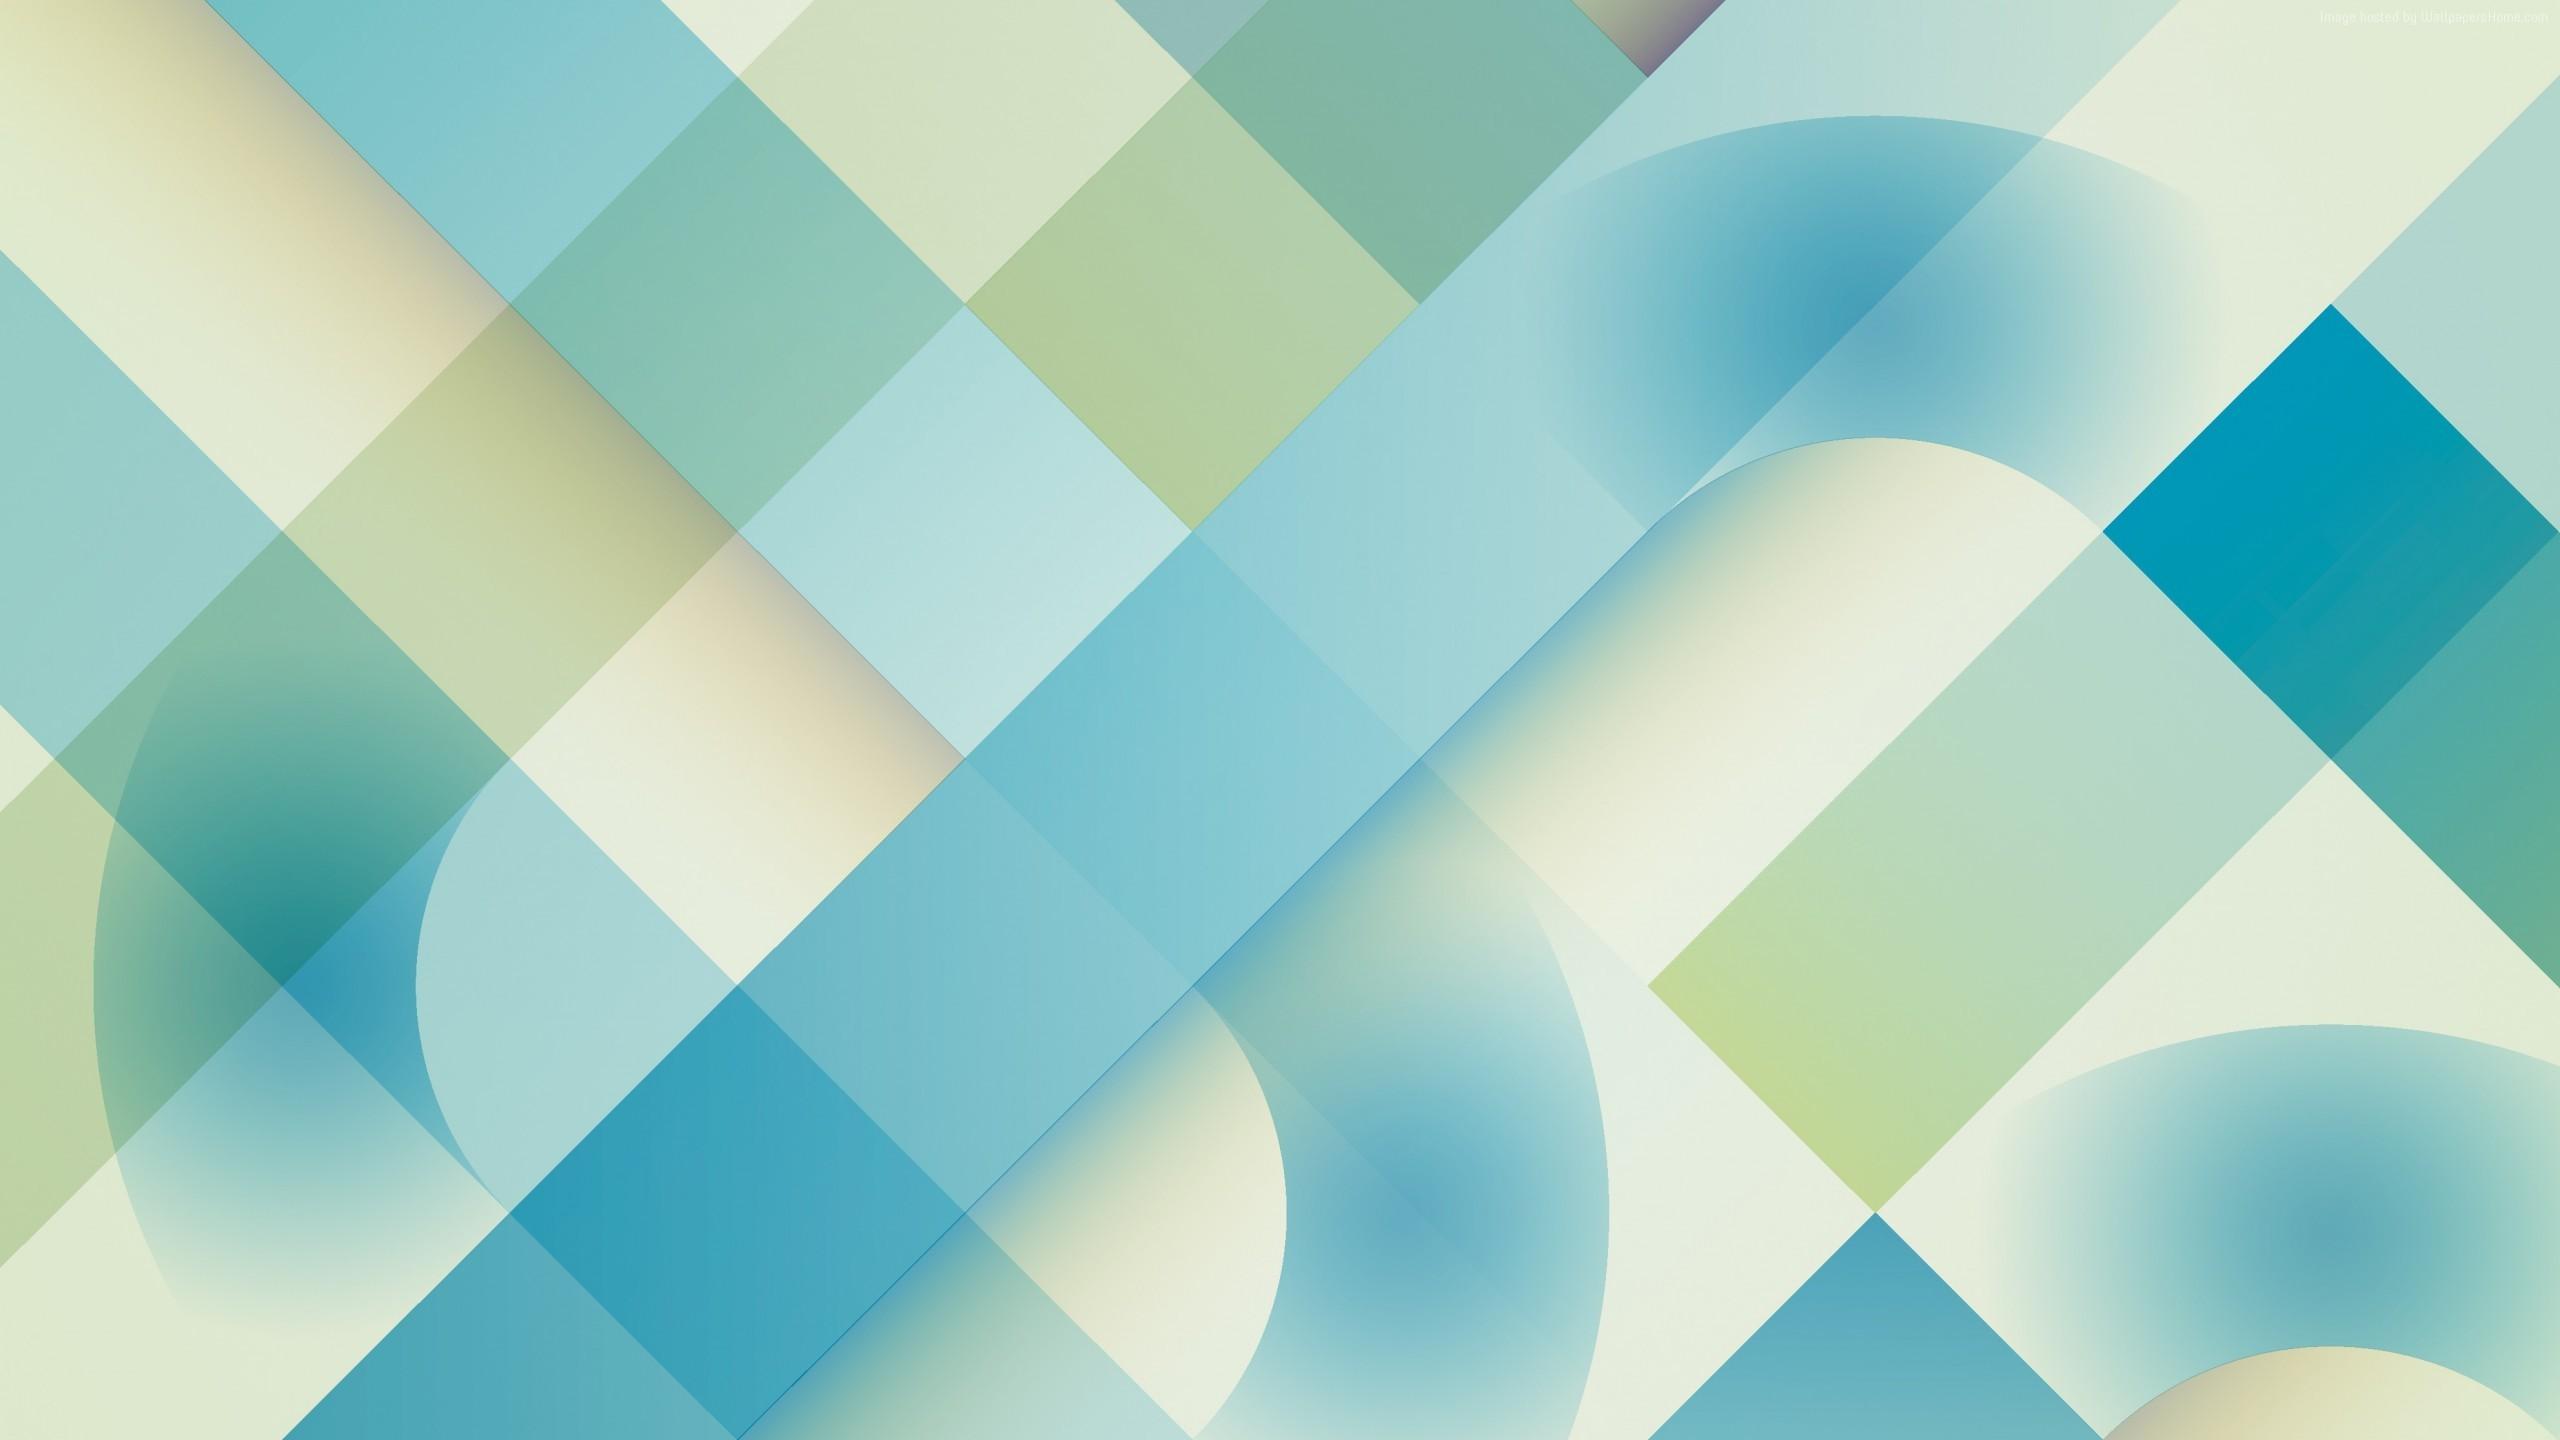 Paling Bagus 29 Wallpaper Biru Aqua Joen Wallpaper